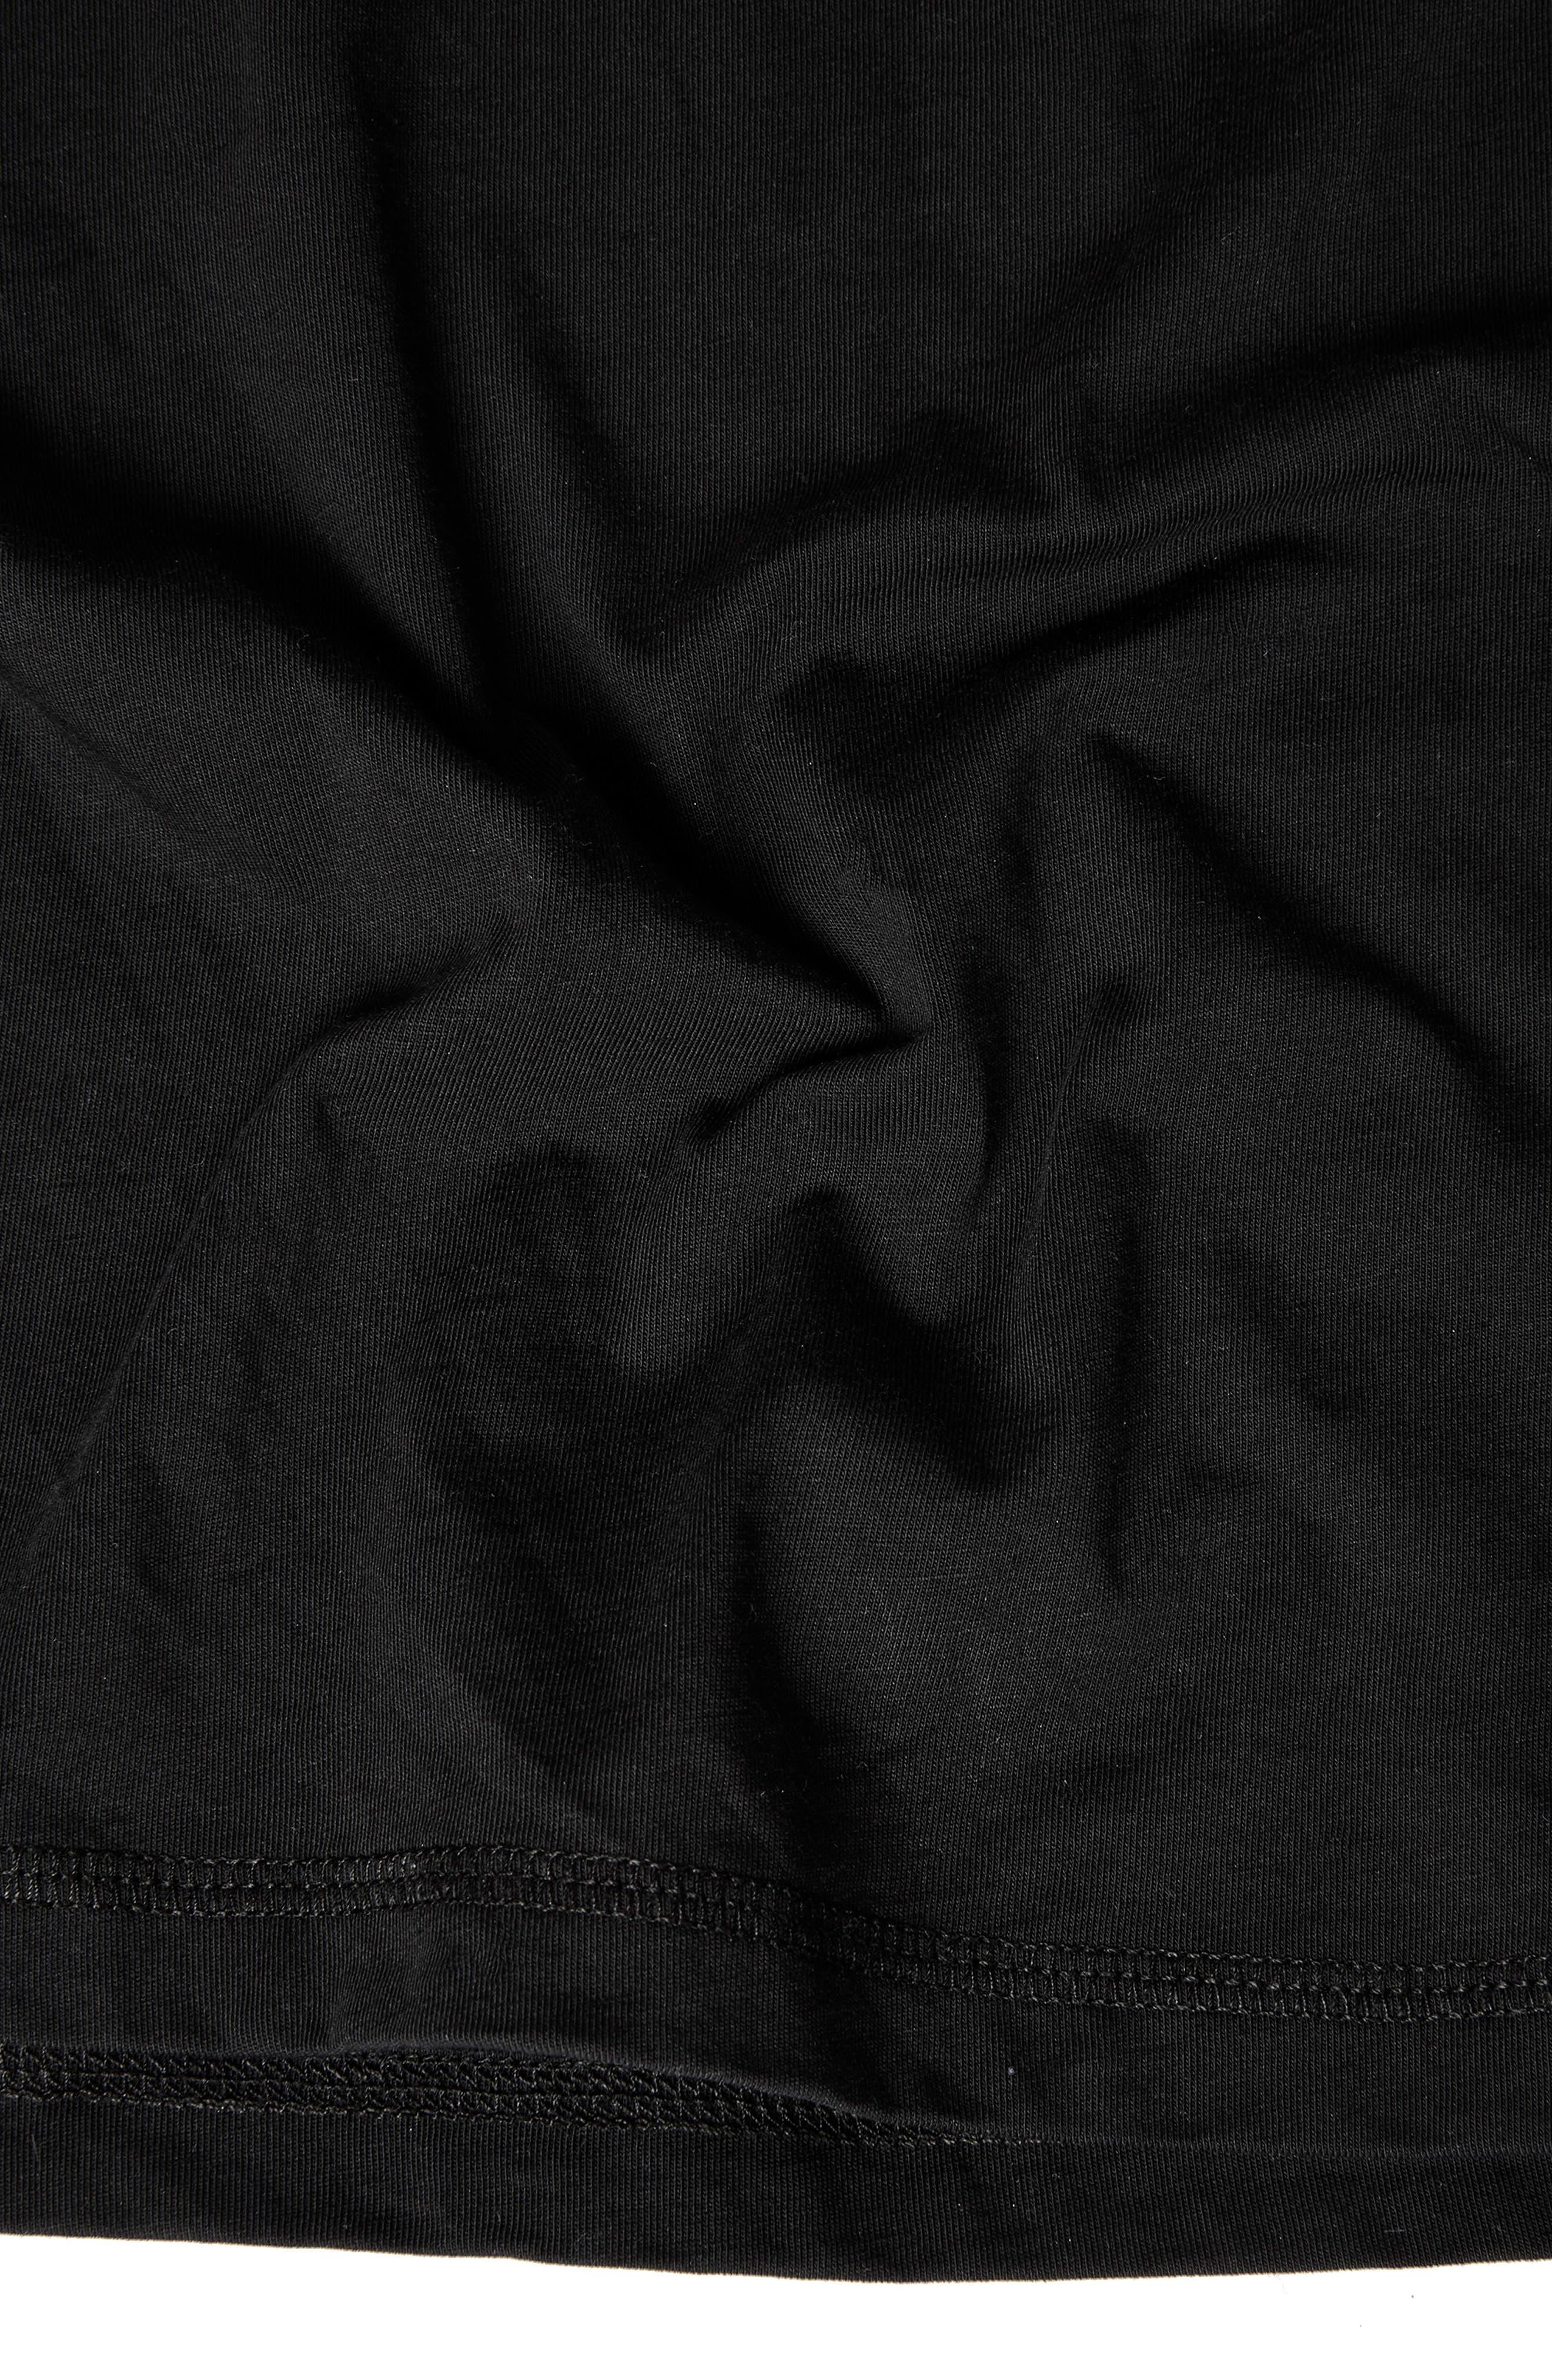 Raw Sleeve Top,                             Alternate thumbnail 3, color,                             Black